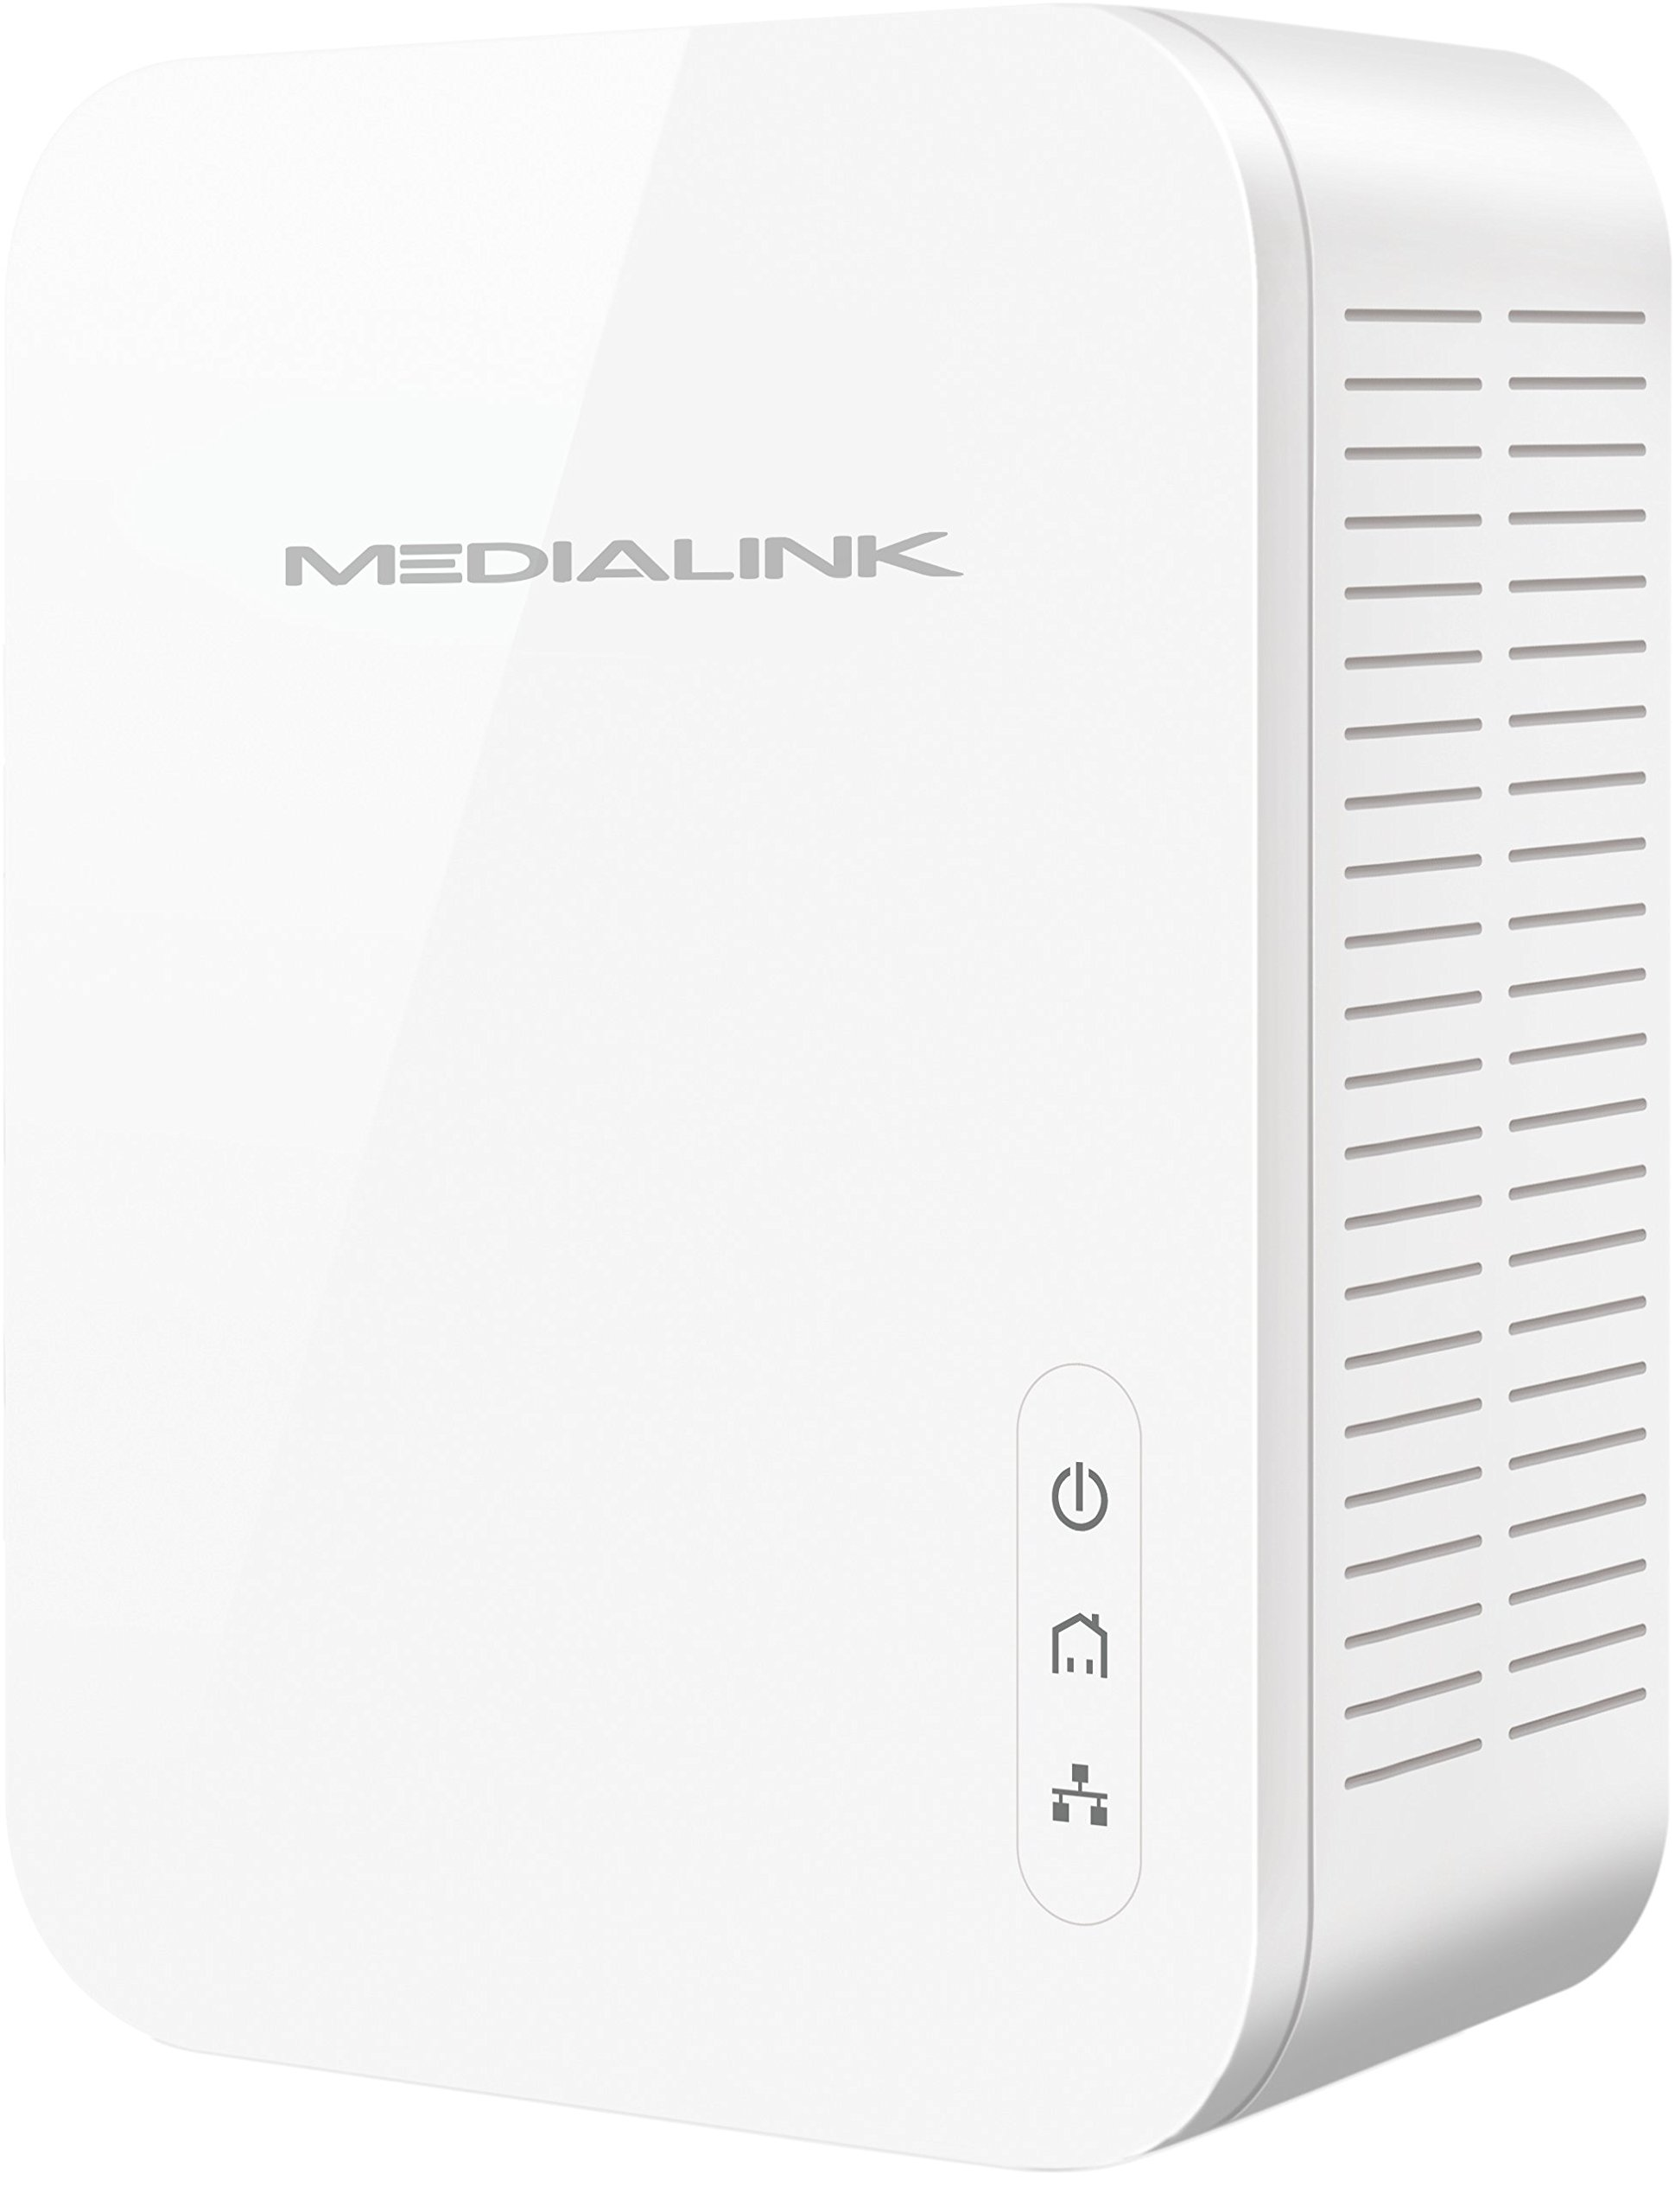 Medialink Gigabit Powerline Adapter Kit (2 Units) - Ethernet Homeplug with Gigabit (1000 Mbps) Wired Speed (Part# MPLA-1000X2) by Mediabridge (Image #4)